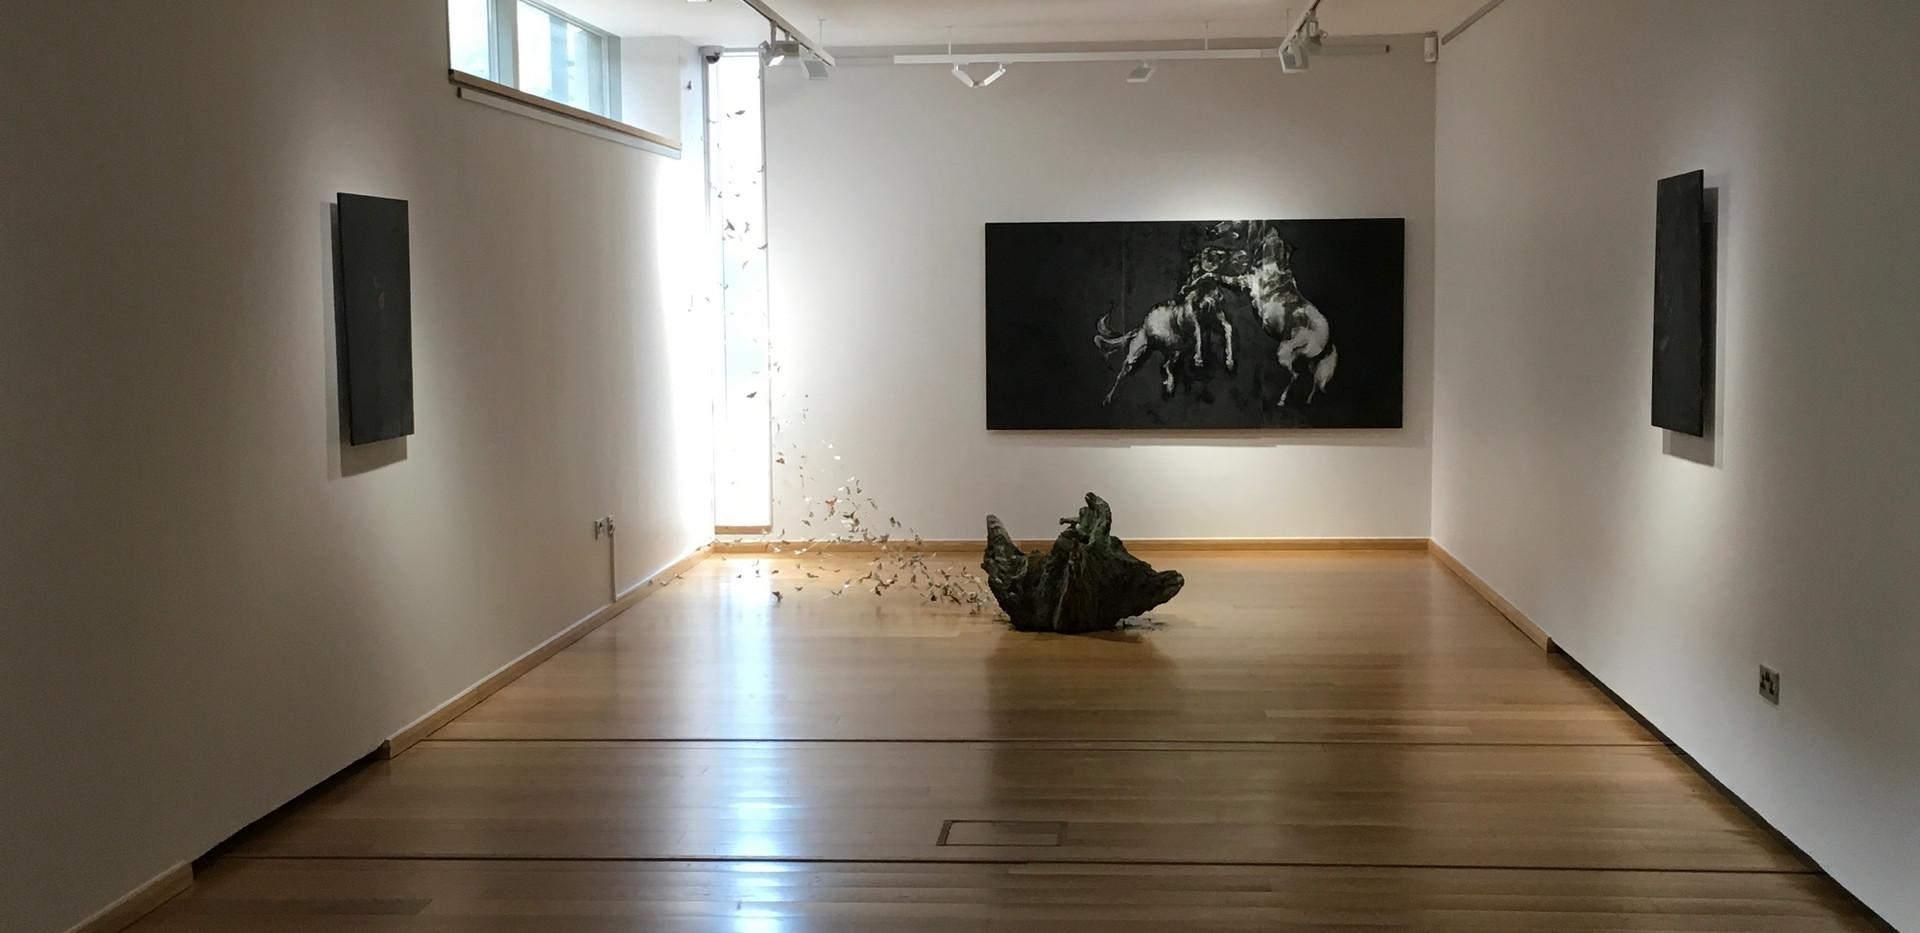 Donna Mann. Reckless Behaviour - Image 1